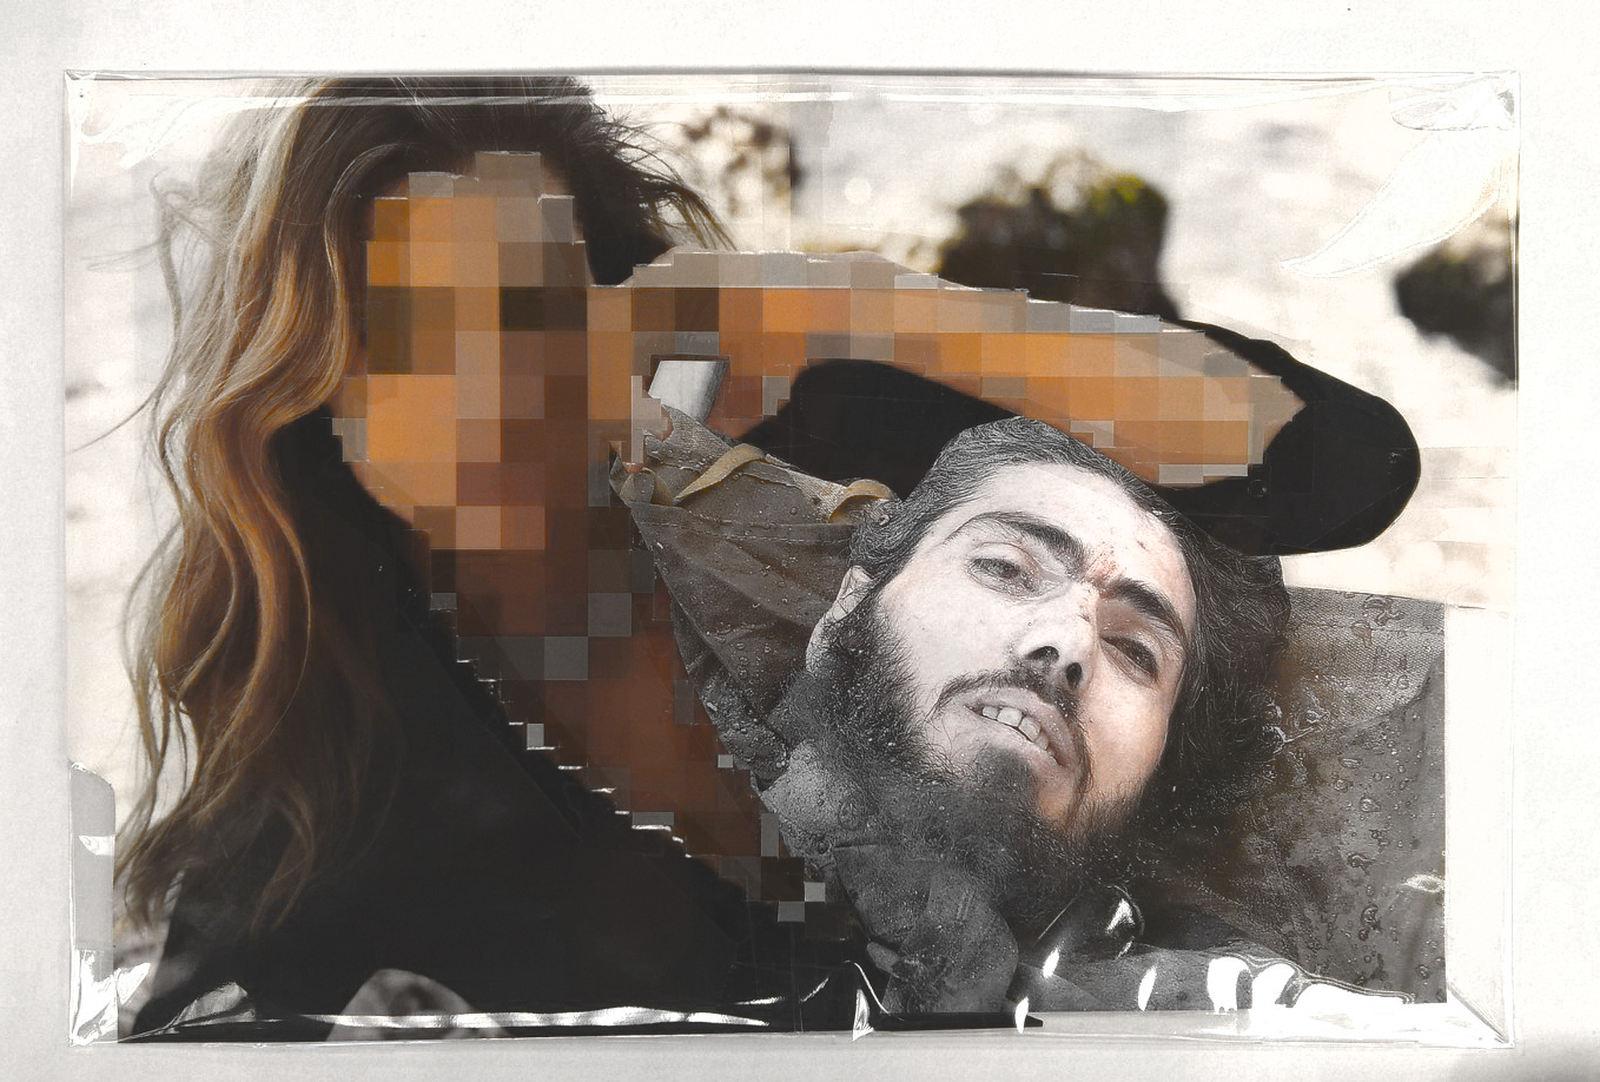 Pixel-Collage nº52, 2016, Prints, tape, transparent sheet, 30x44,5 cm